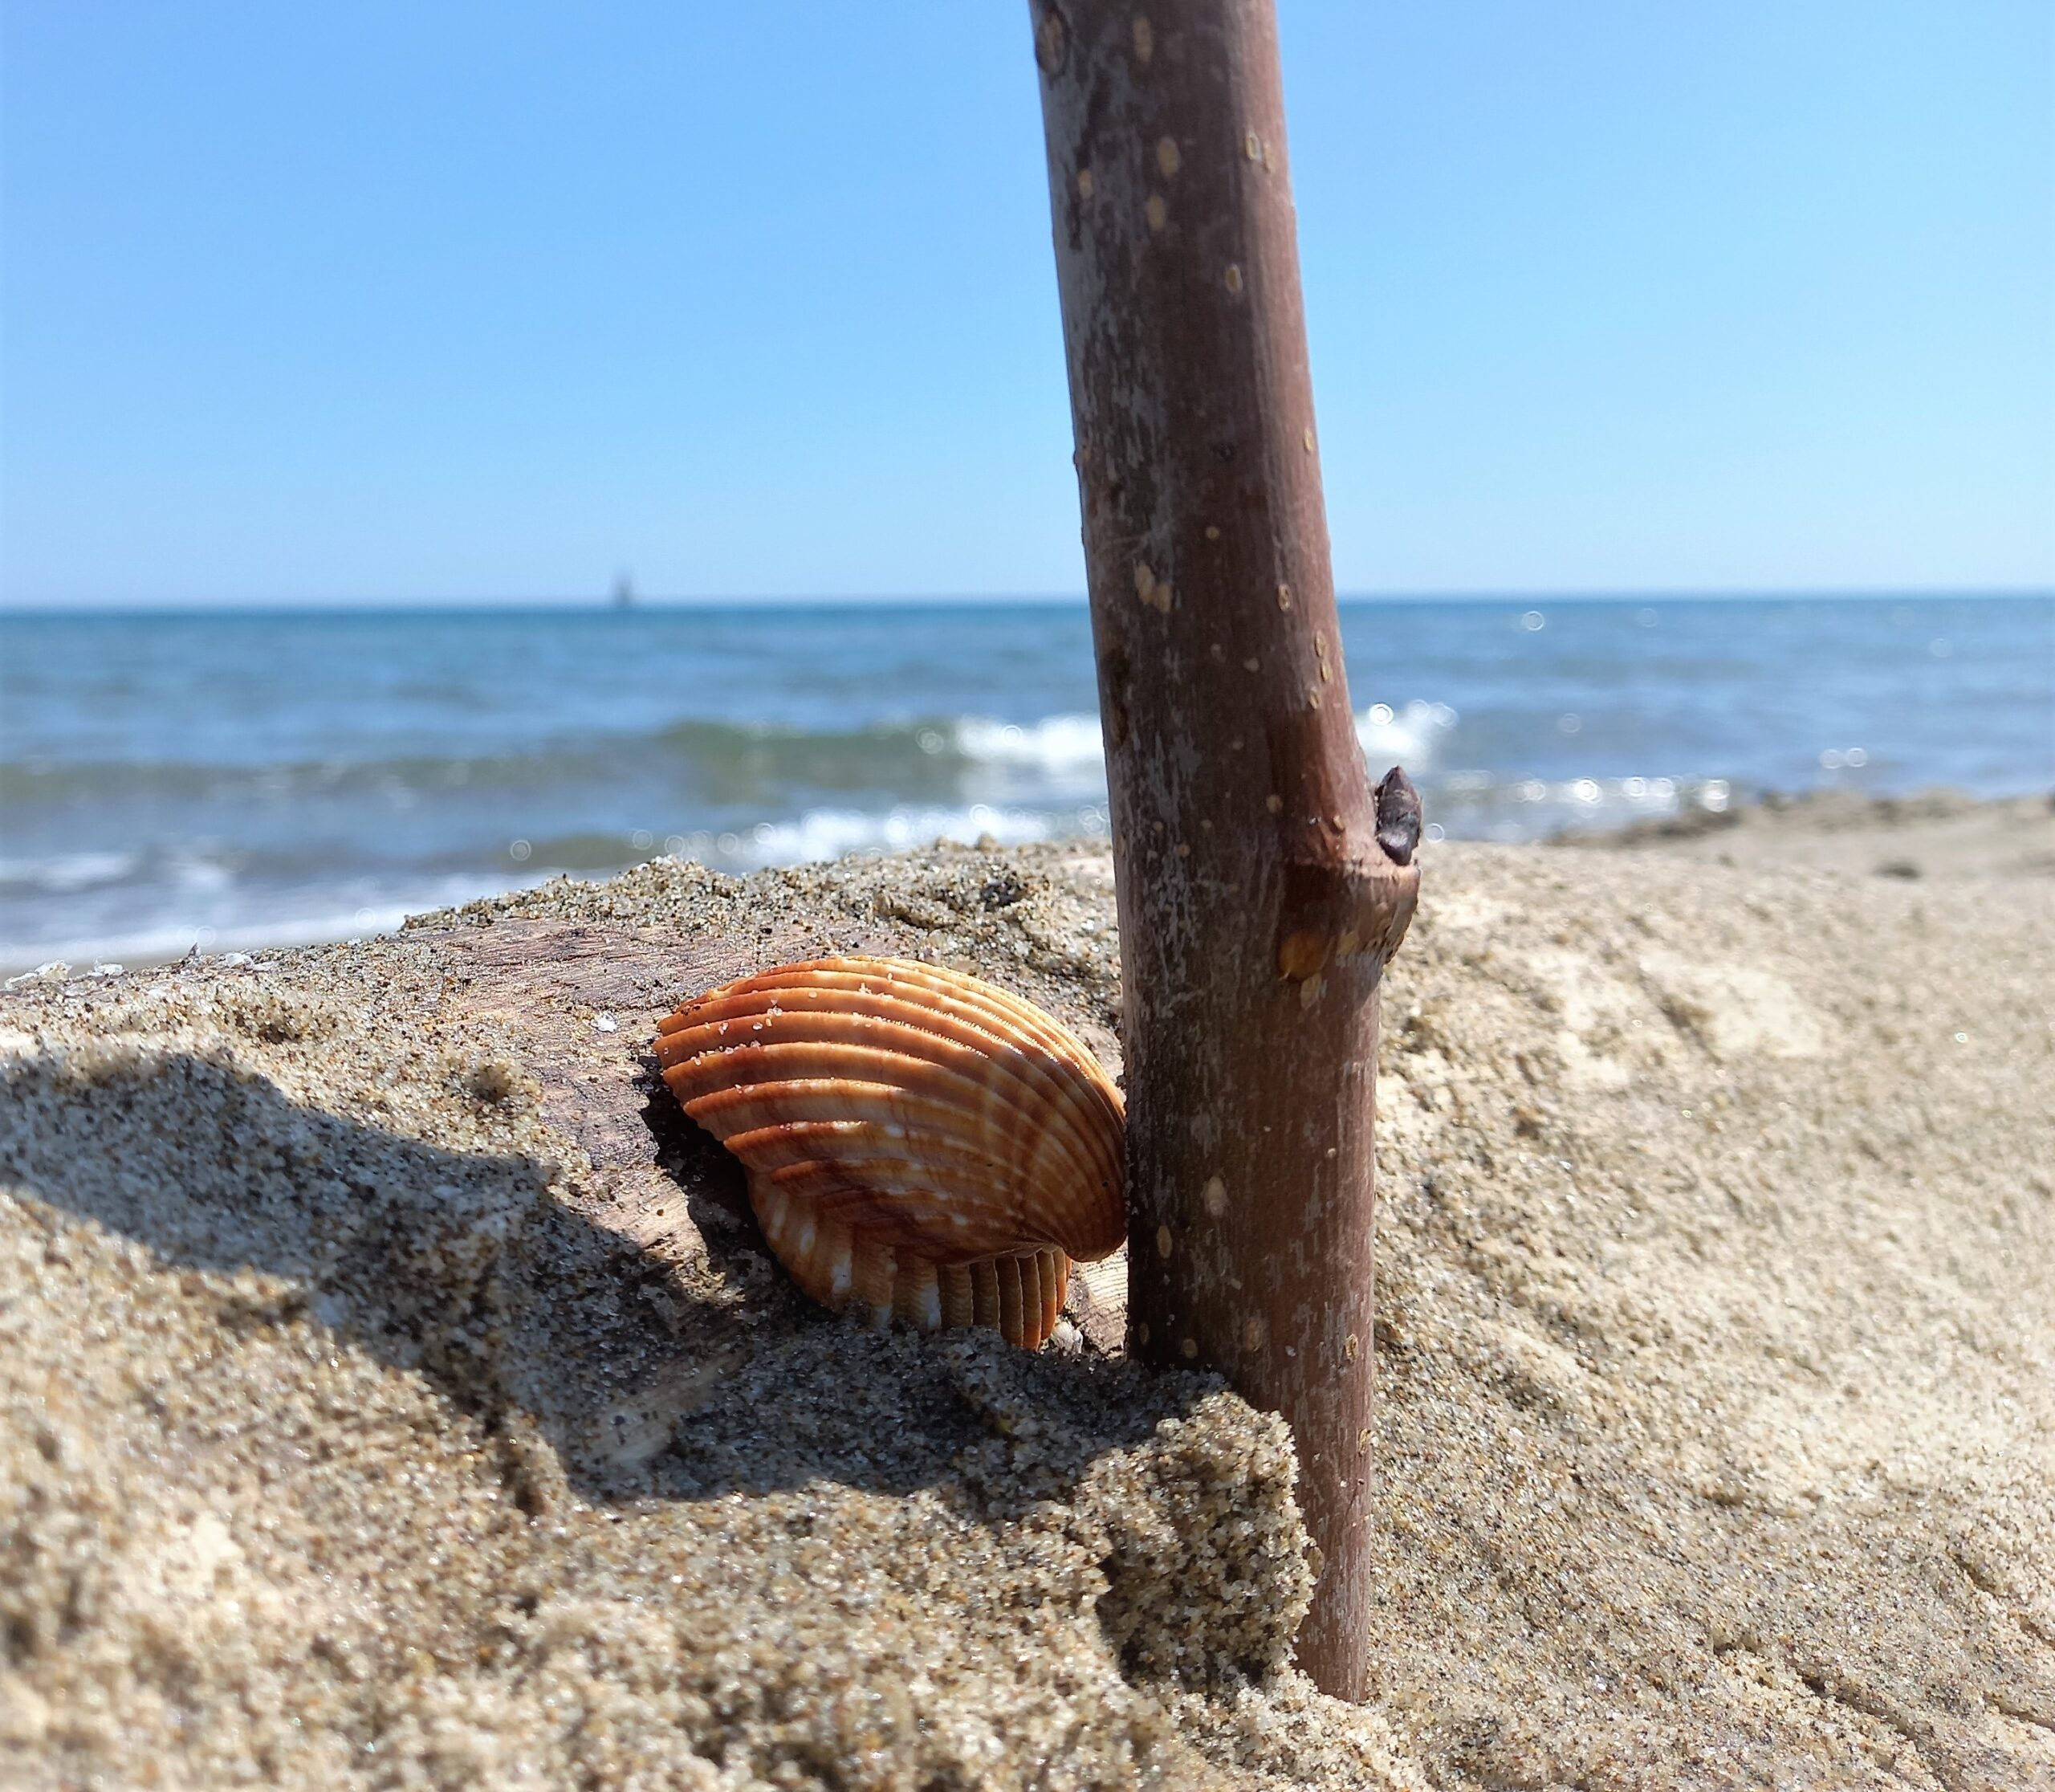 museo del mare sicily needs love